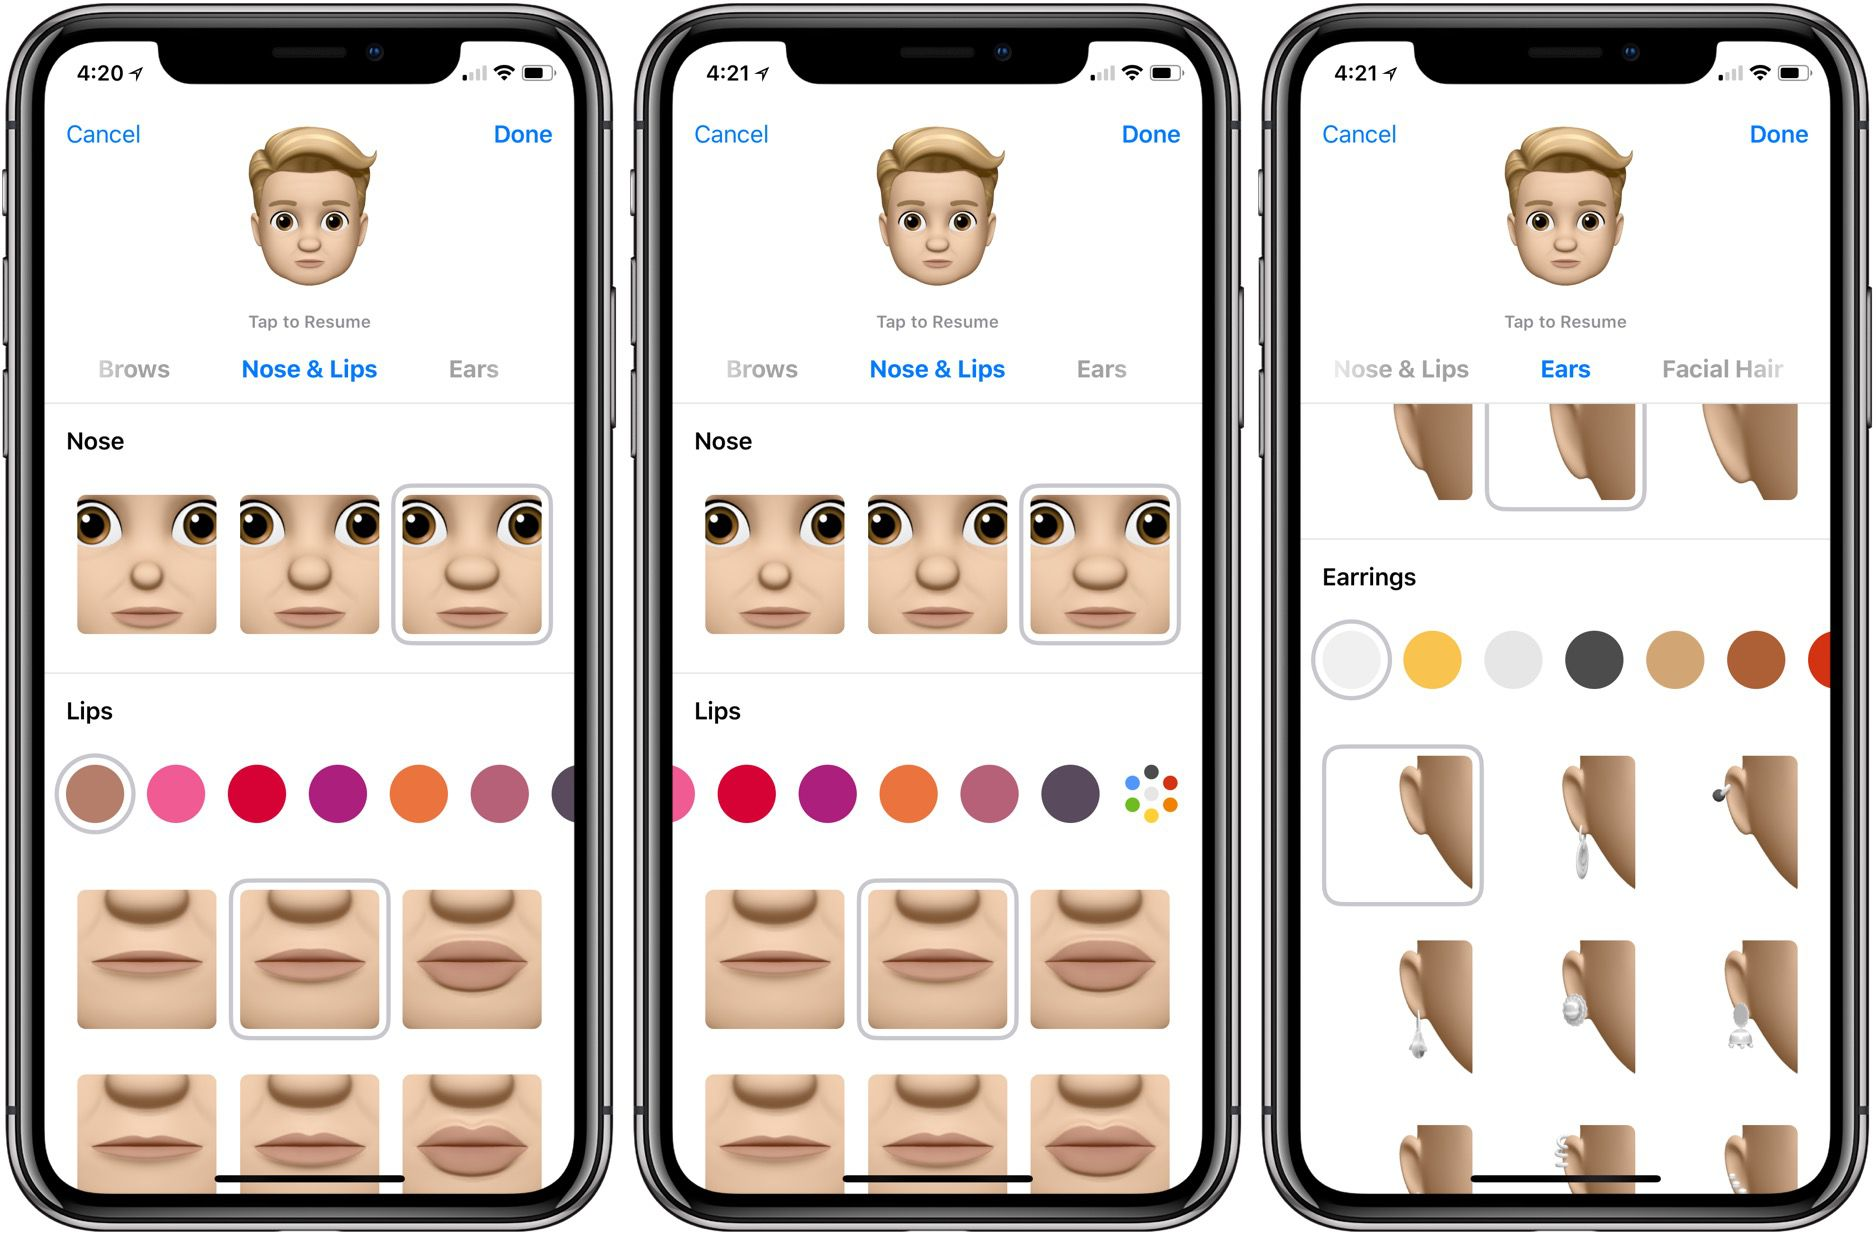 iOS 12: How to create Memoji on iPhone X - 9to5Mac